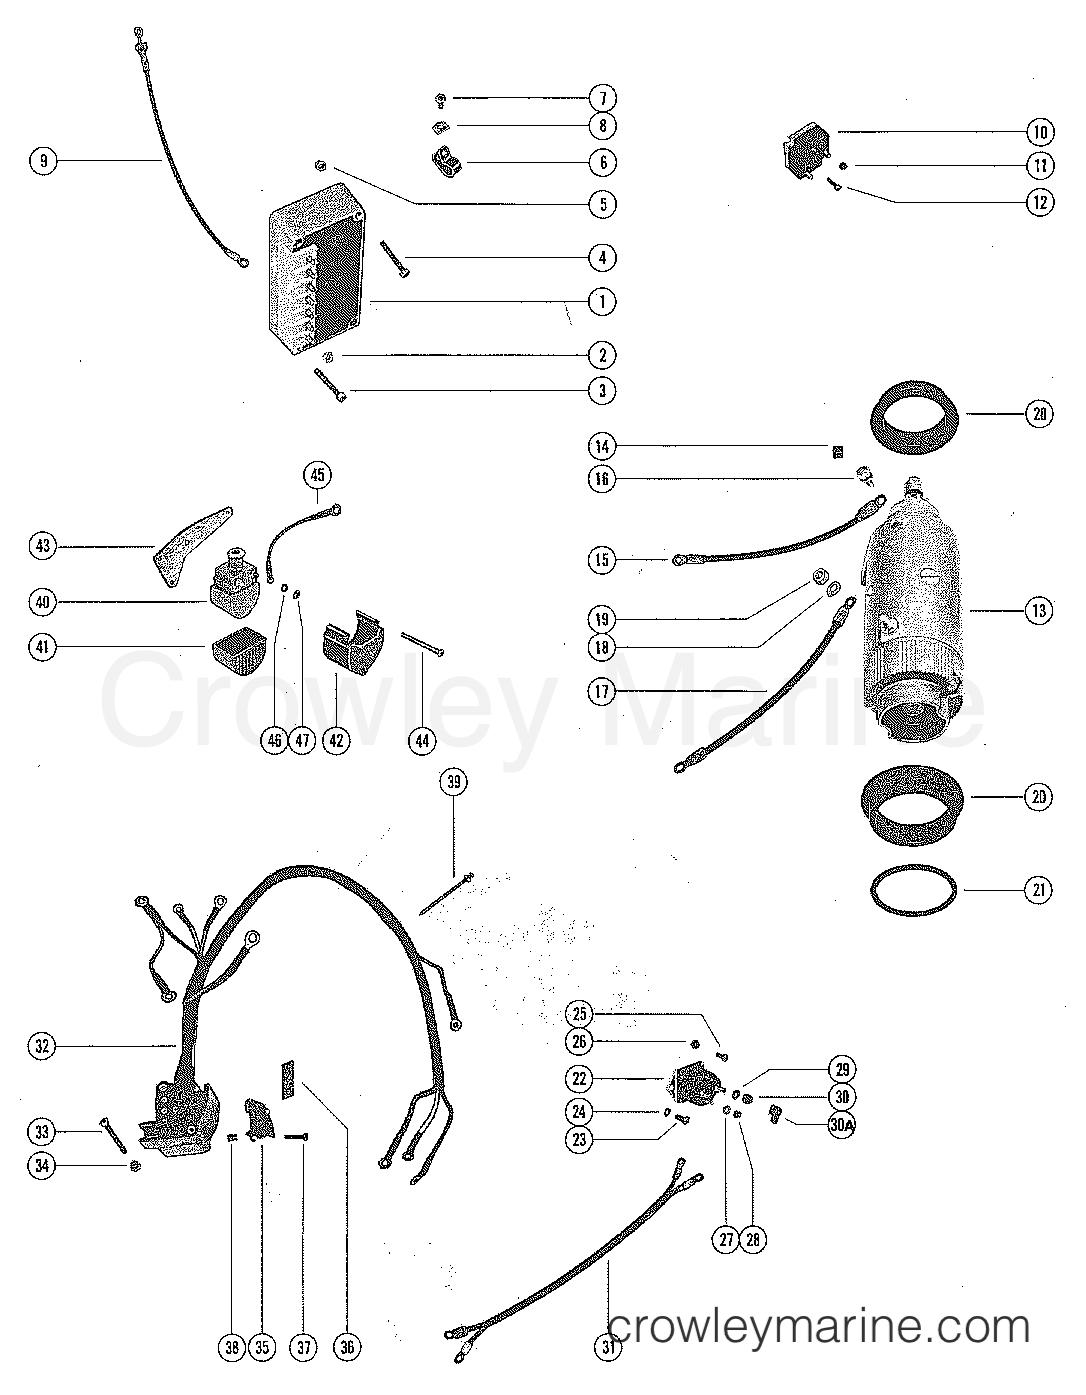 viper remote start wiring diagram moreover viper alarm remote